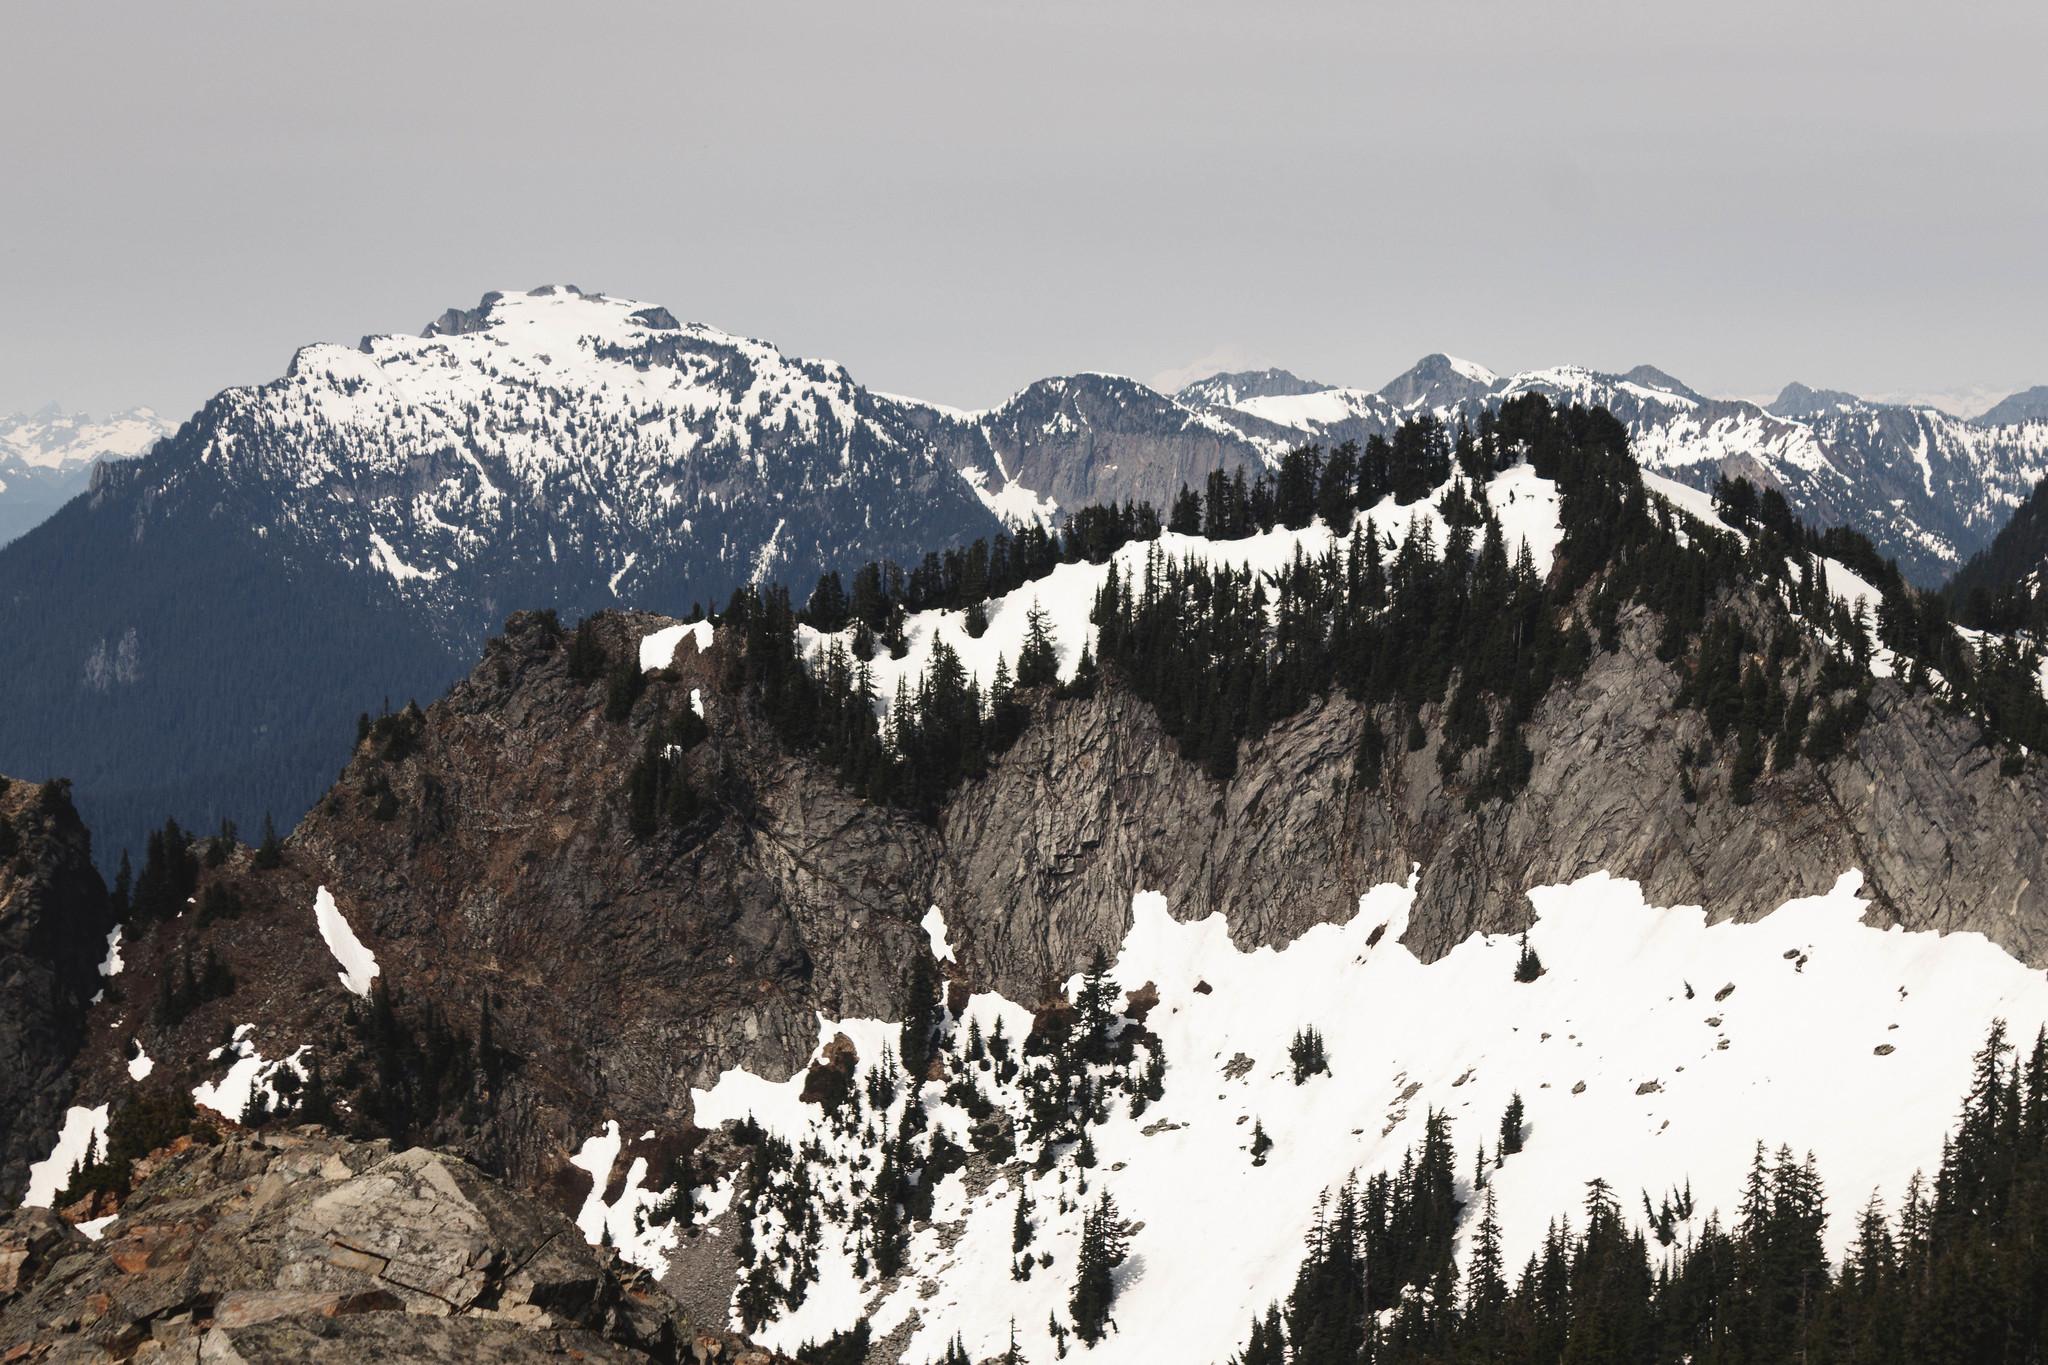 Big Snow Mountain and Kendall Katwalk Peak